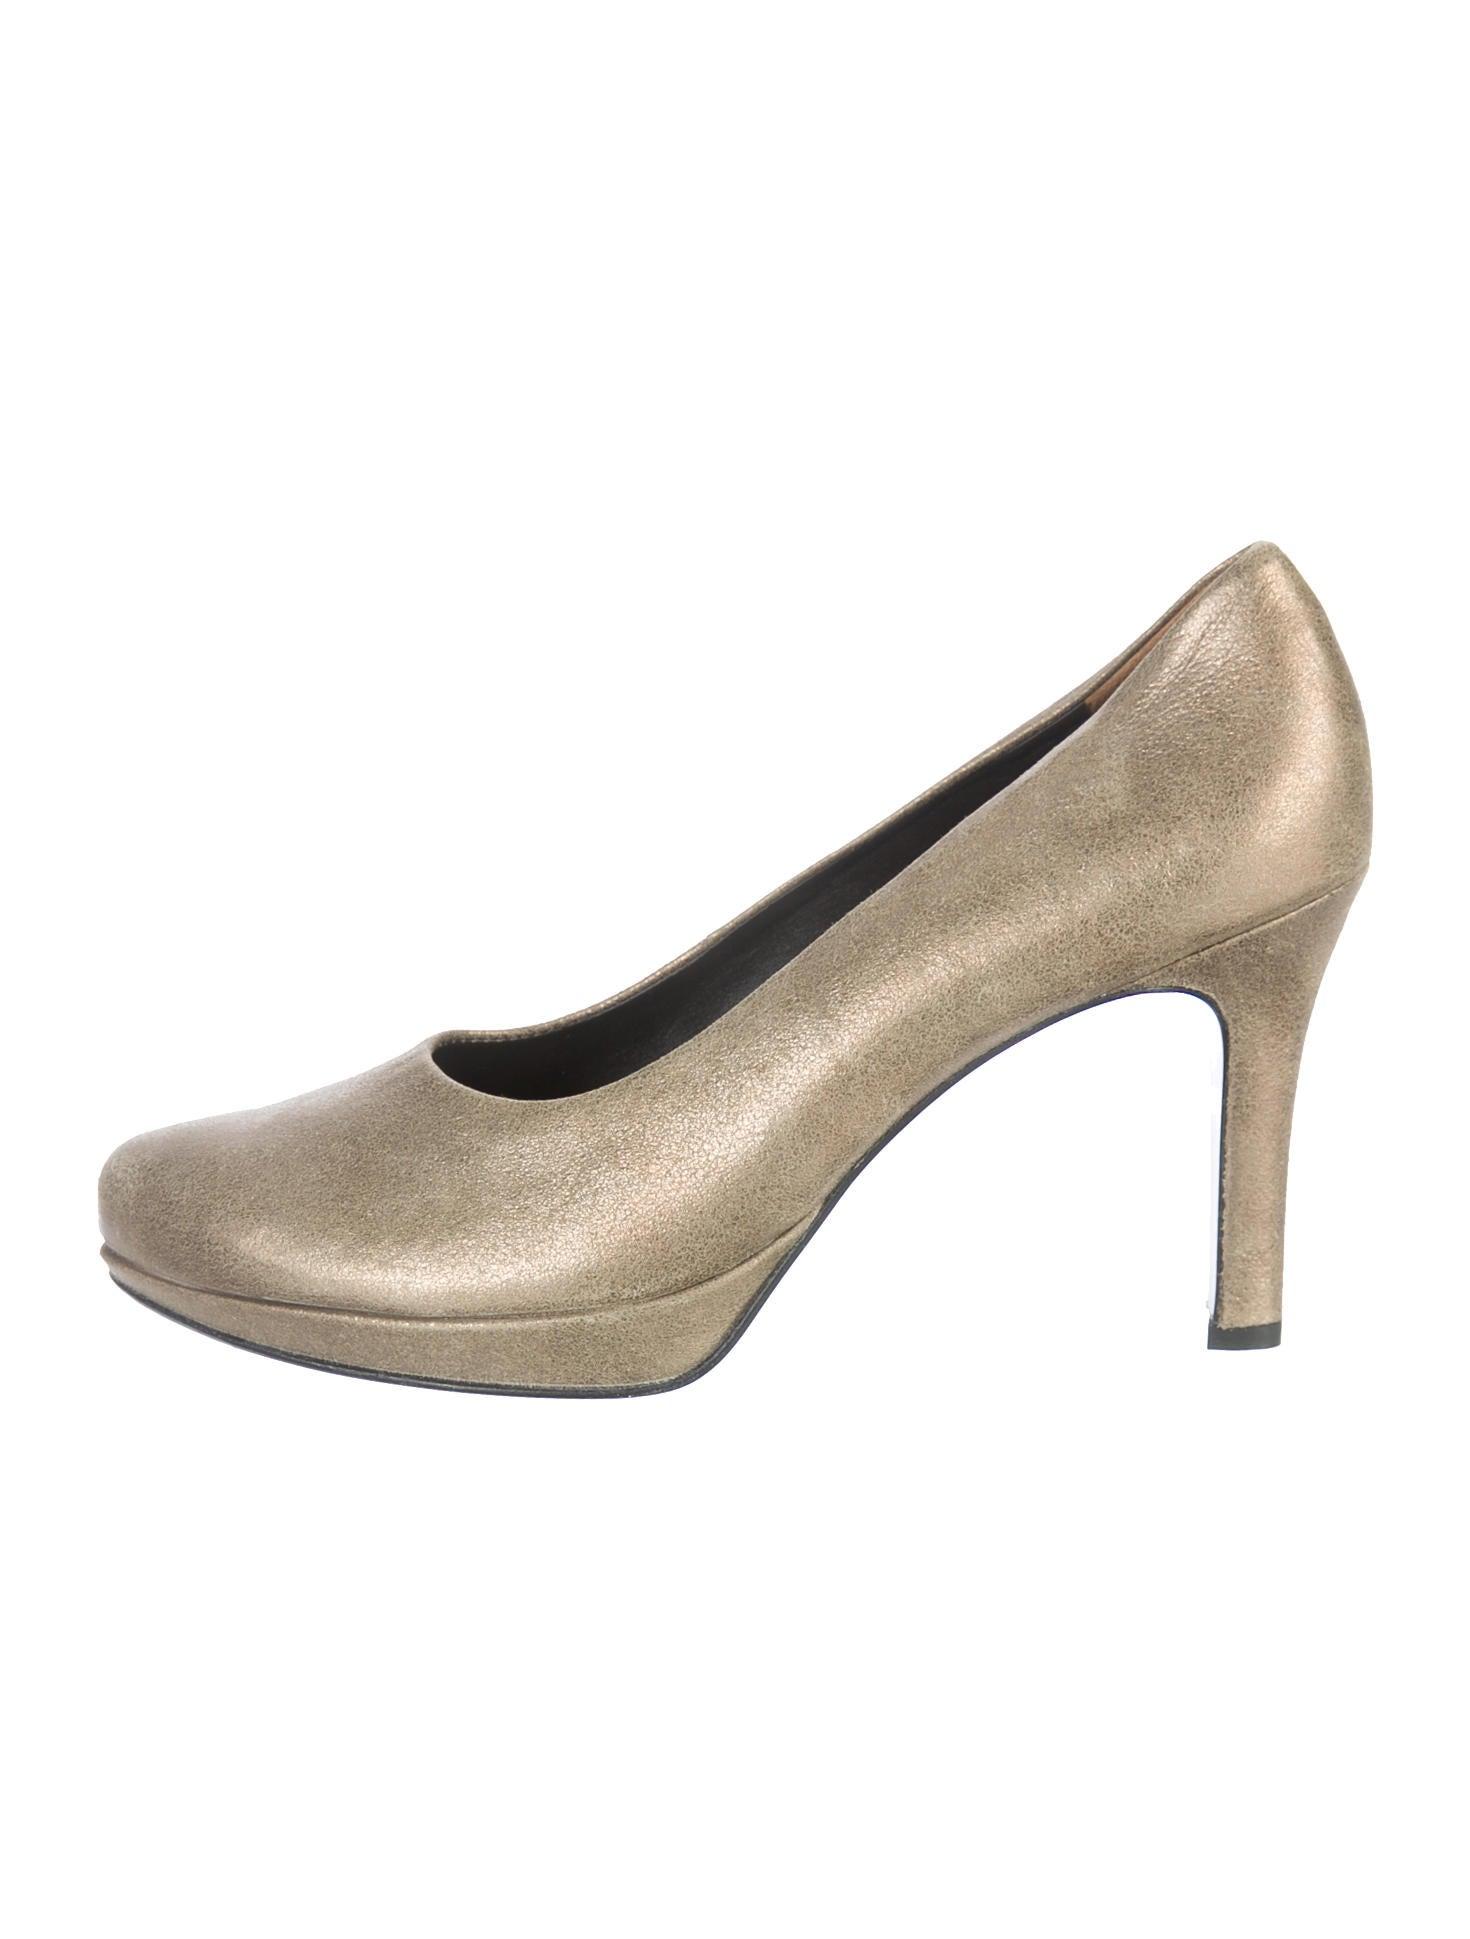 paul green metallic pumps shoes wpaul20010 the realreal. Black Bedroom Furniture Sets. Home Design Ideas